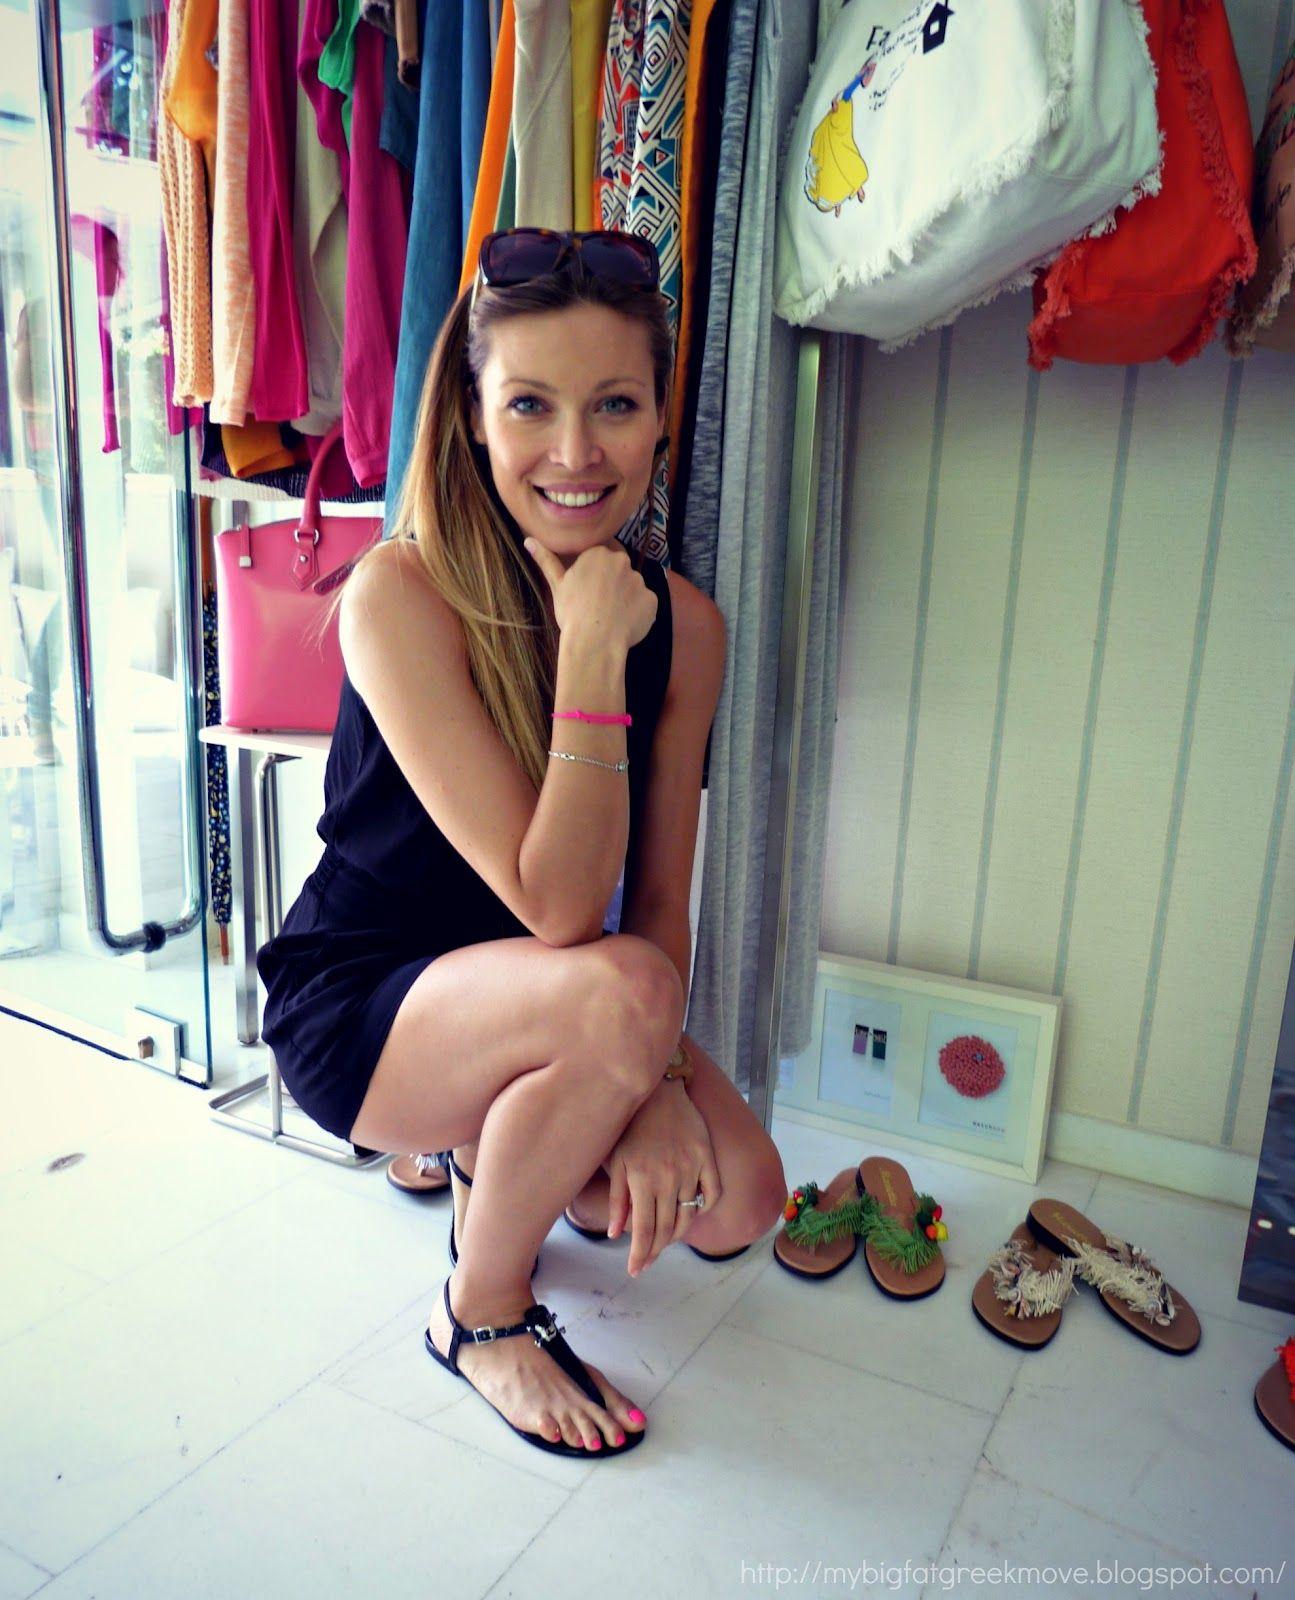 db9423e688a BRIT GREEK  Happy Feet  Mariettas Fantasy Sandal Collection 2012 Model